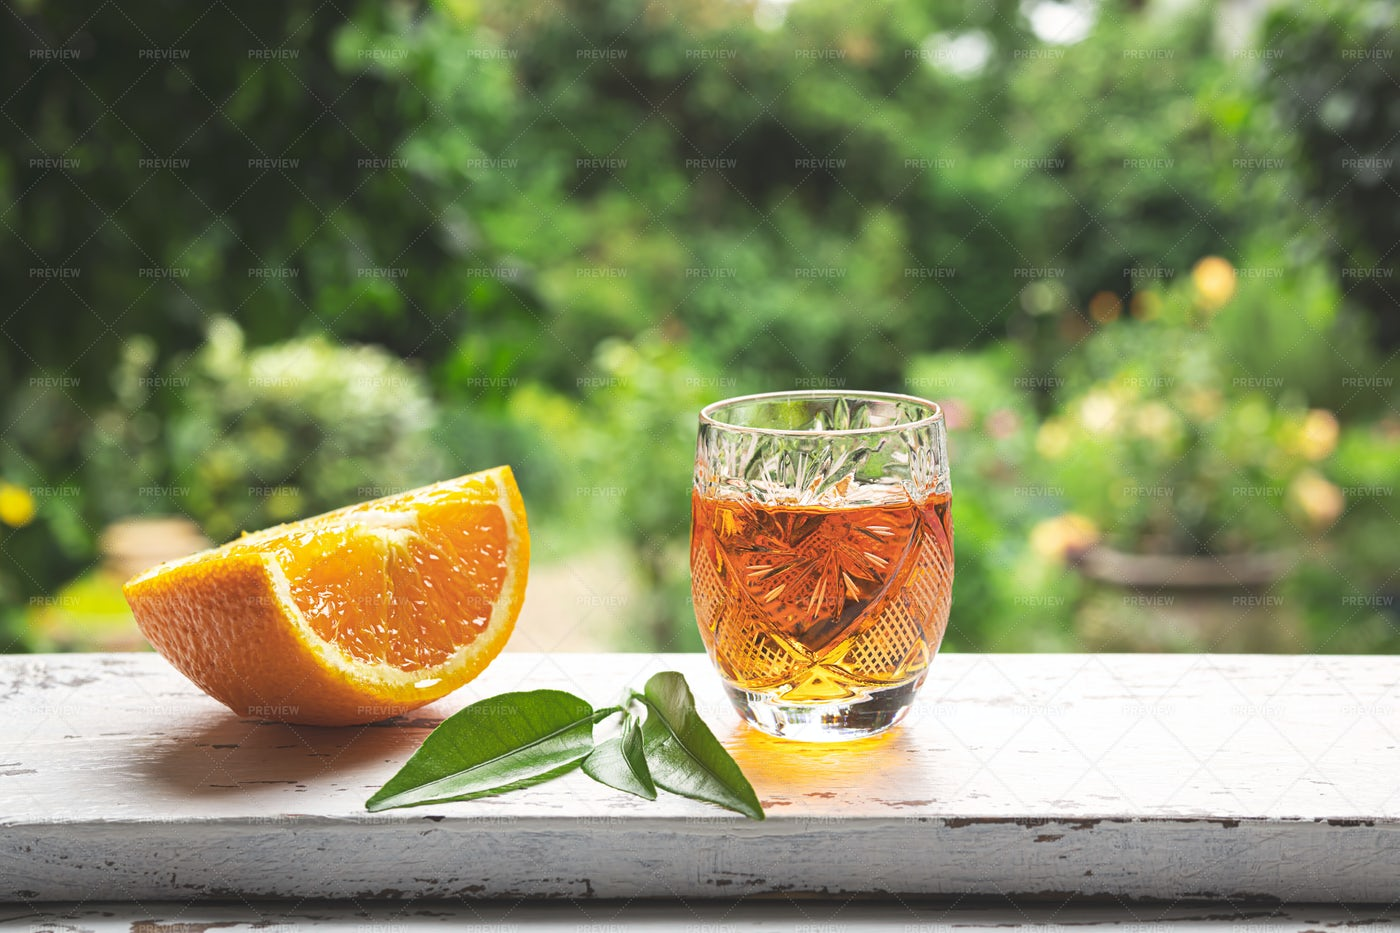 Tangerine Liqueur On A Windowsill: Stock Photos